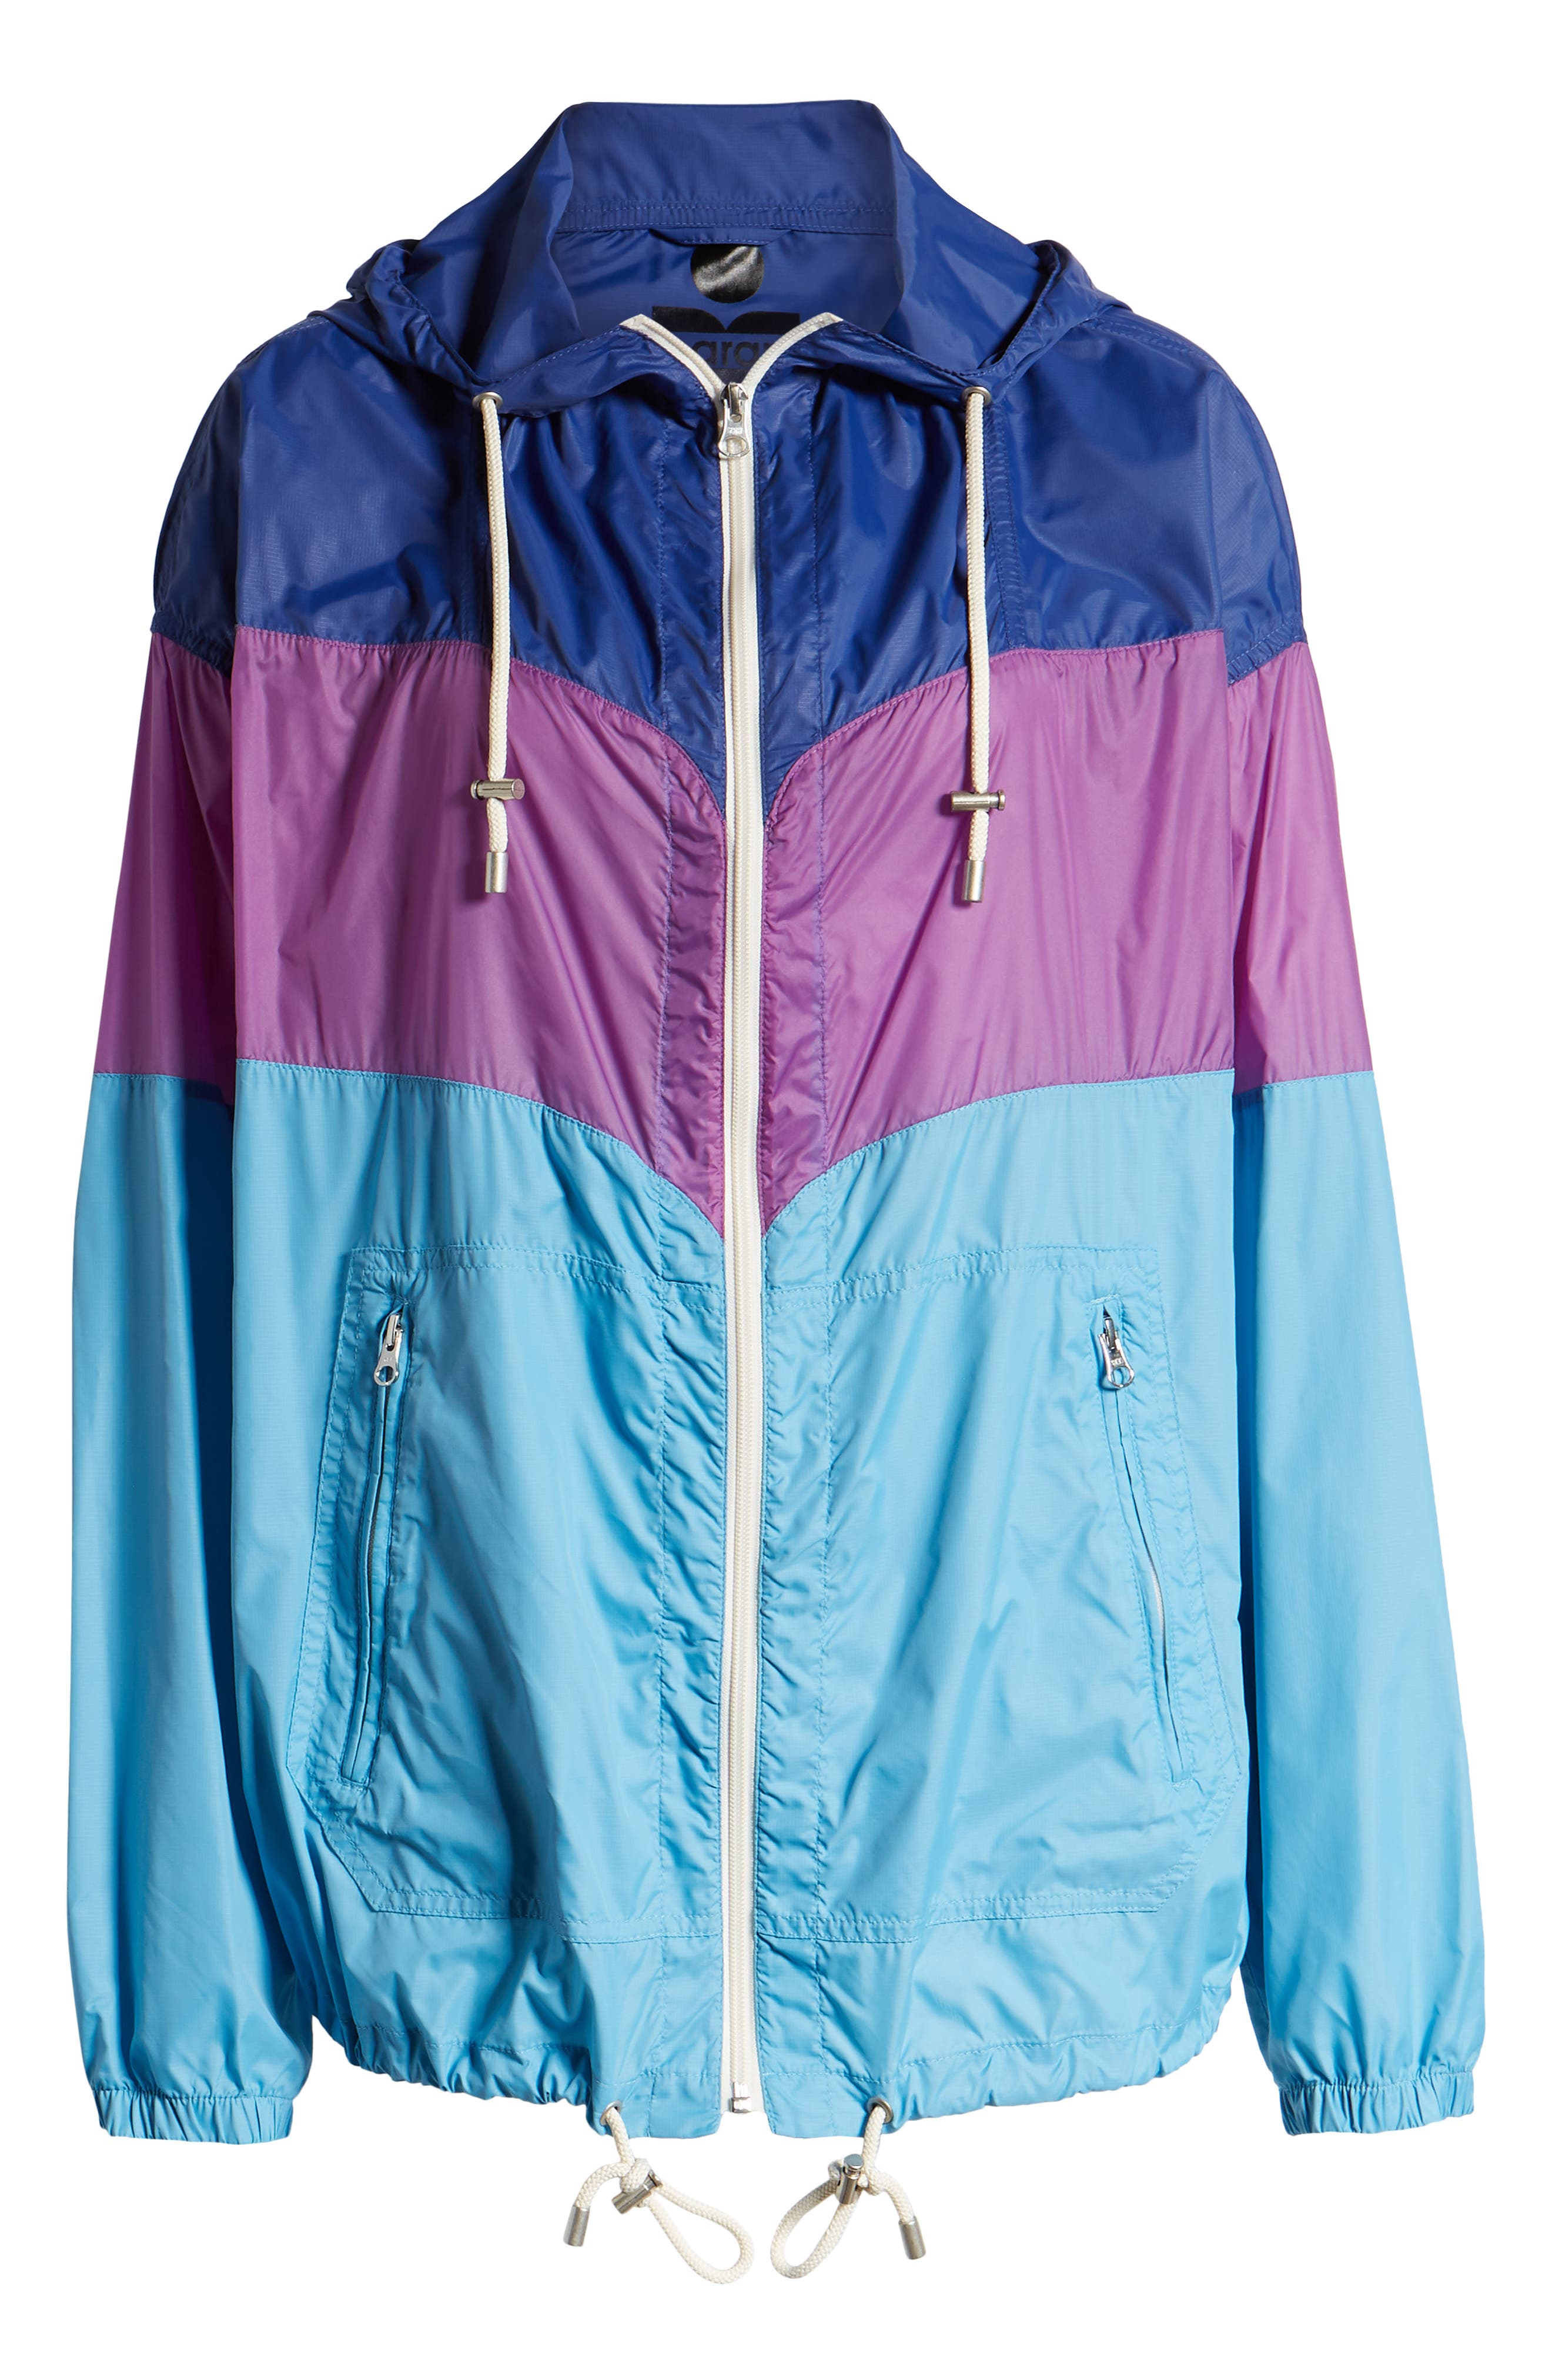 ISABEL MARANT ÉTOILE, Kyriel Colorblock Hooded Jacket, Alternate thumbnail 6, color, ELECTRIC BLUE/ VIOLET